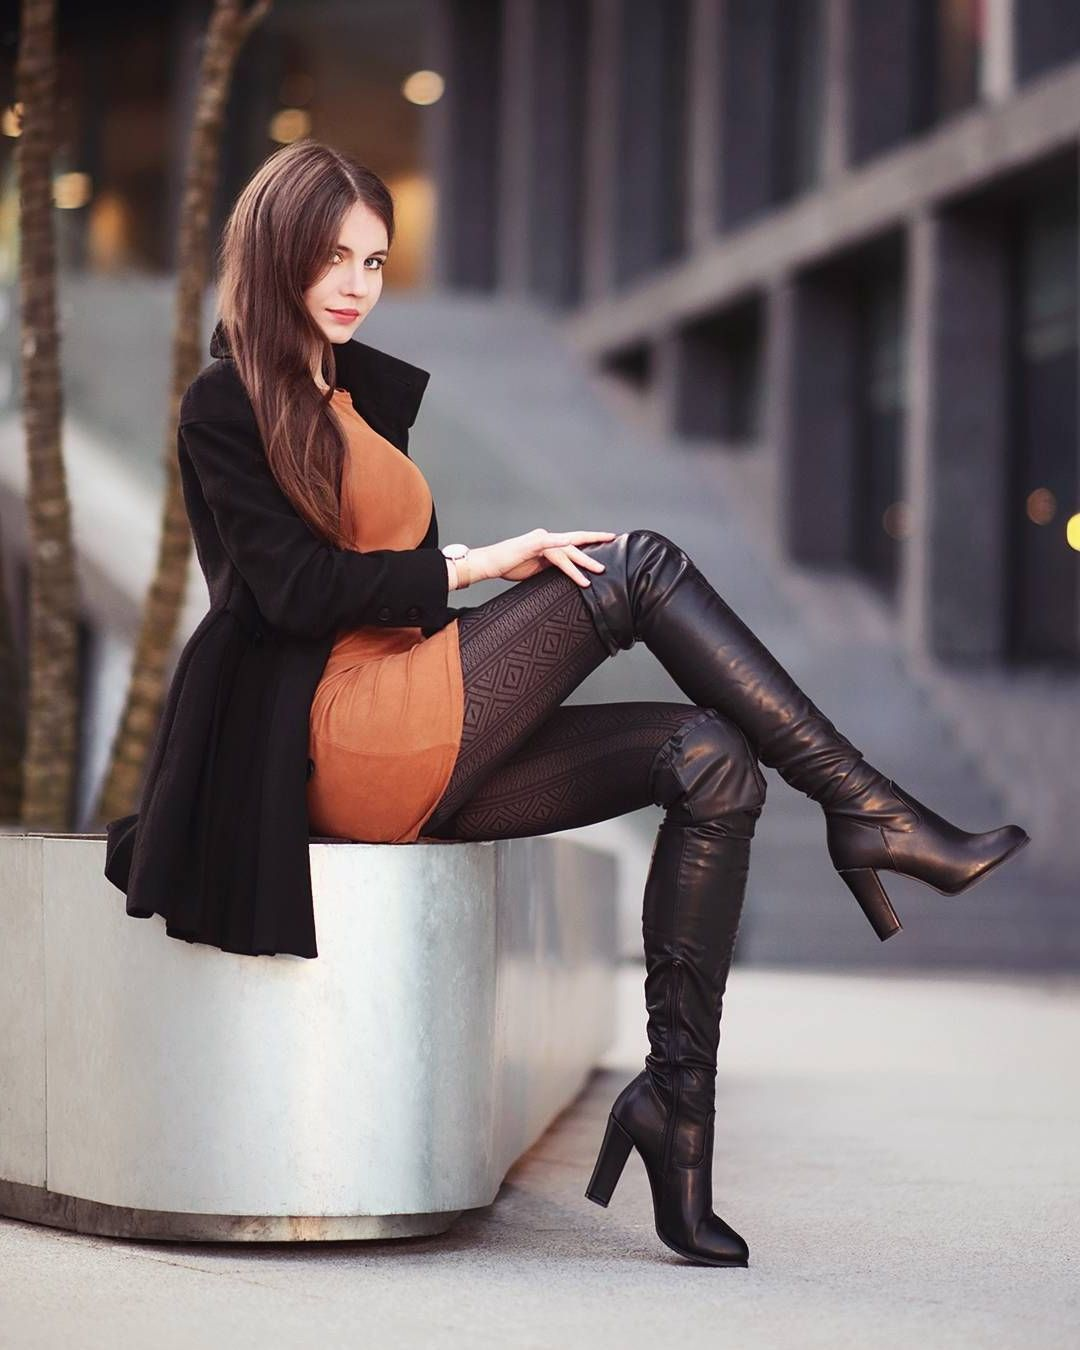 buxom-woman-wearing-boots-british-women